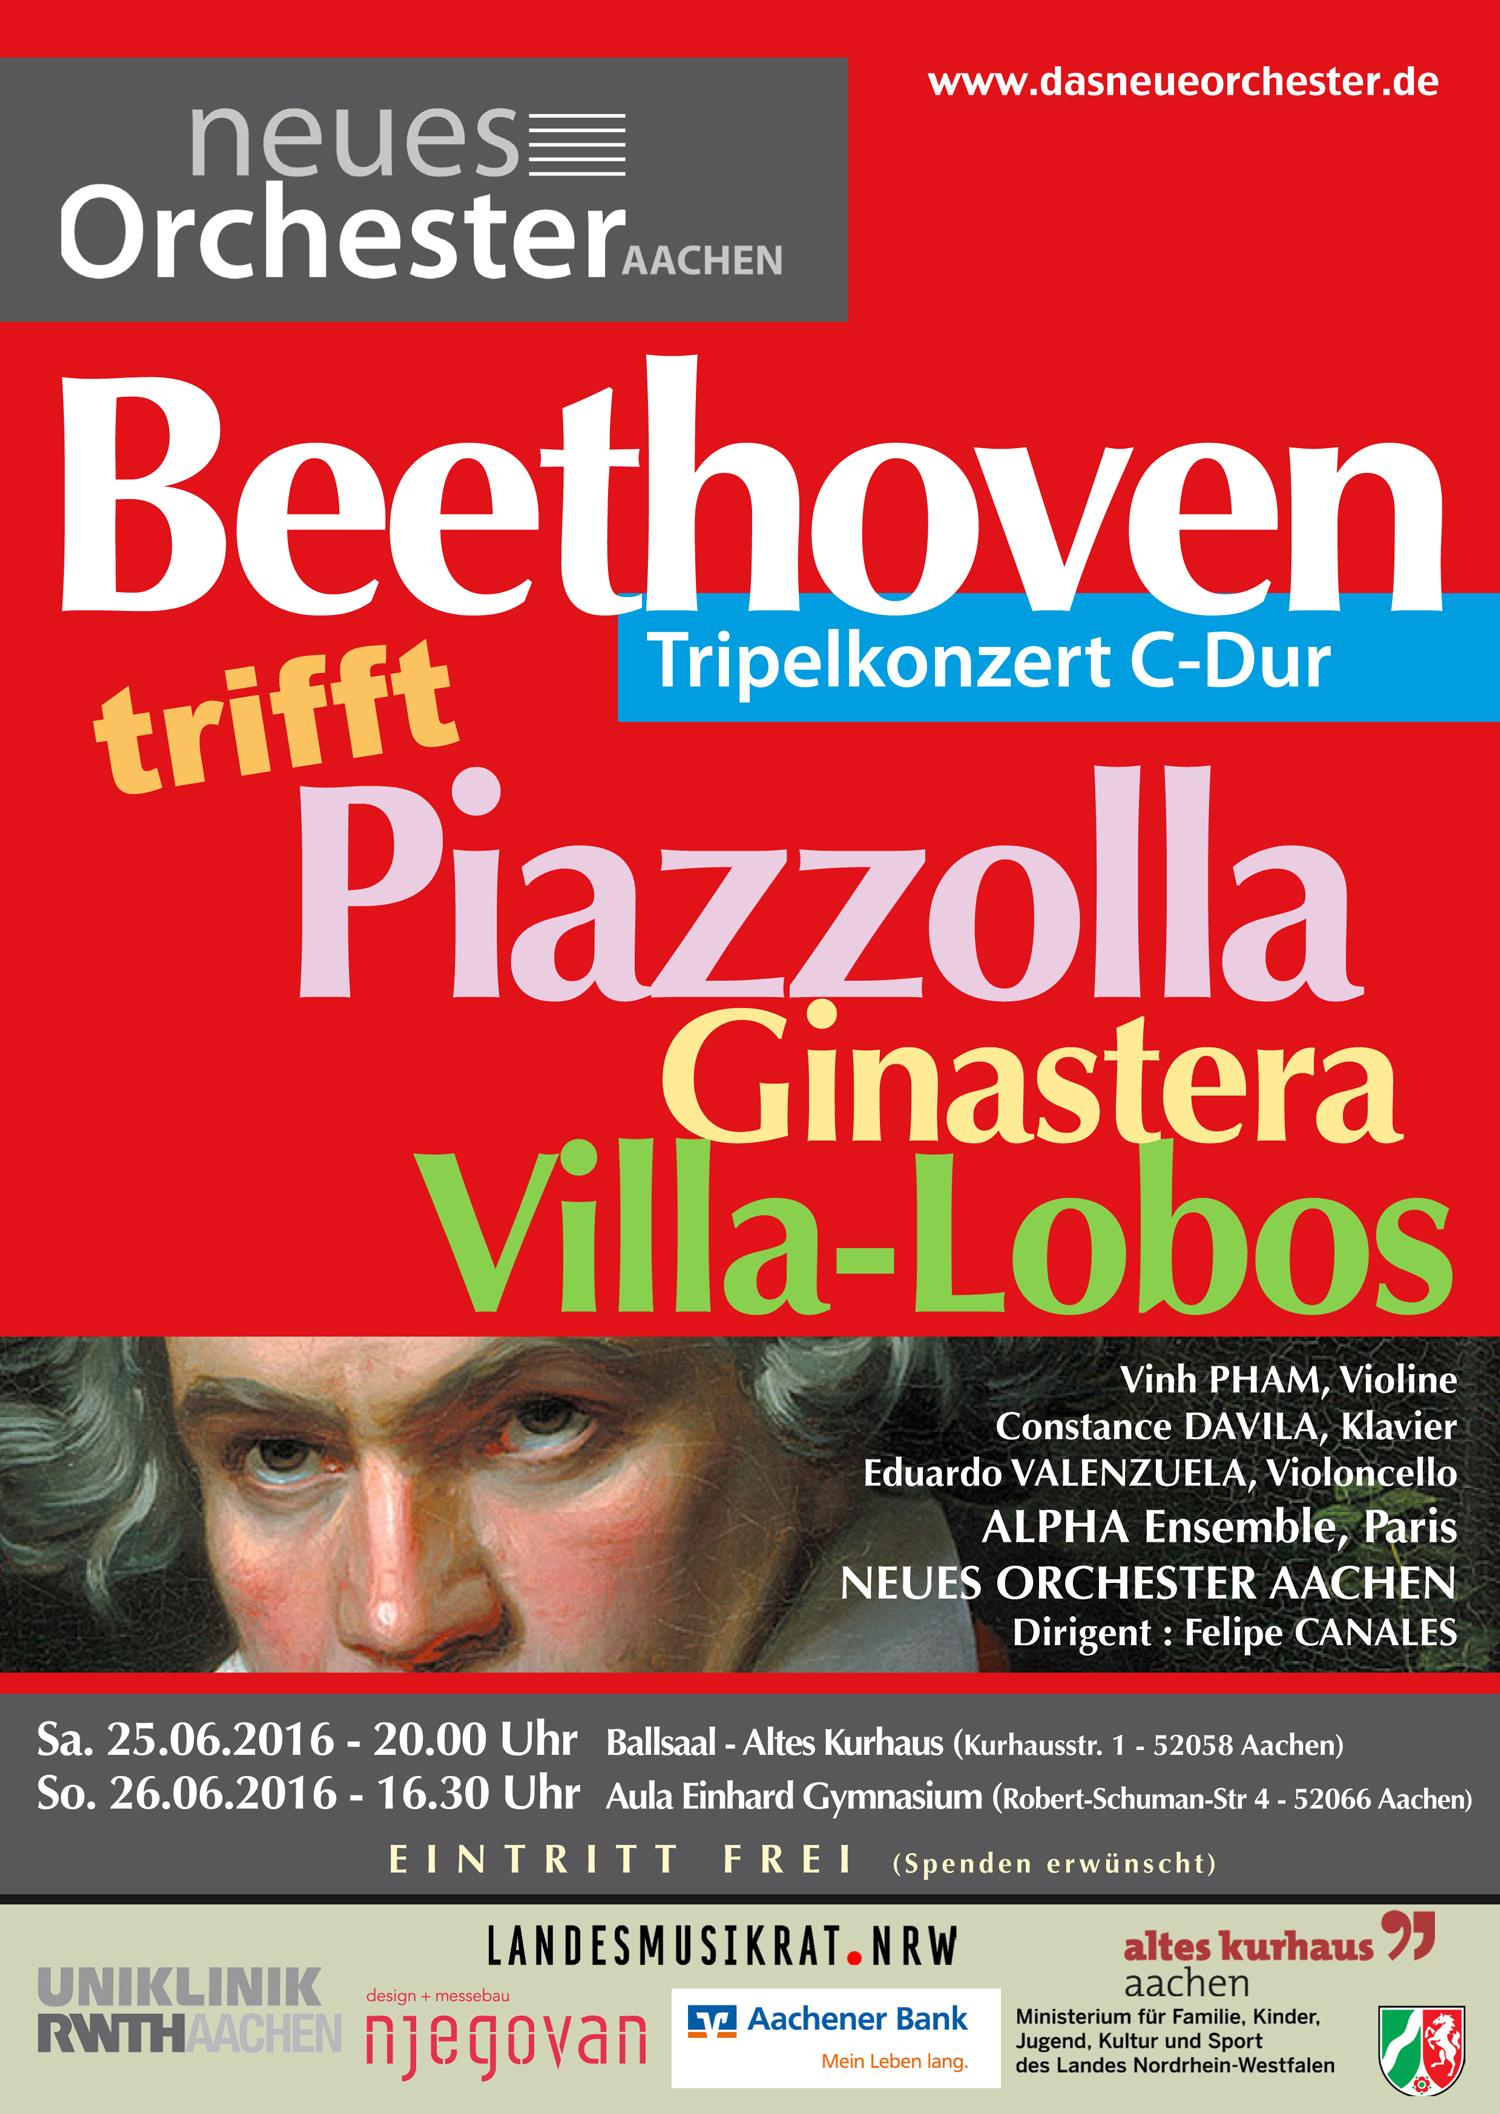 Konzert : Beethoven trifft Piazzolla, Ginastera, Villa-Lobos